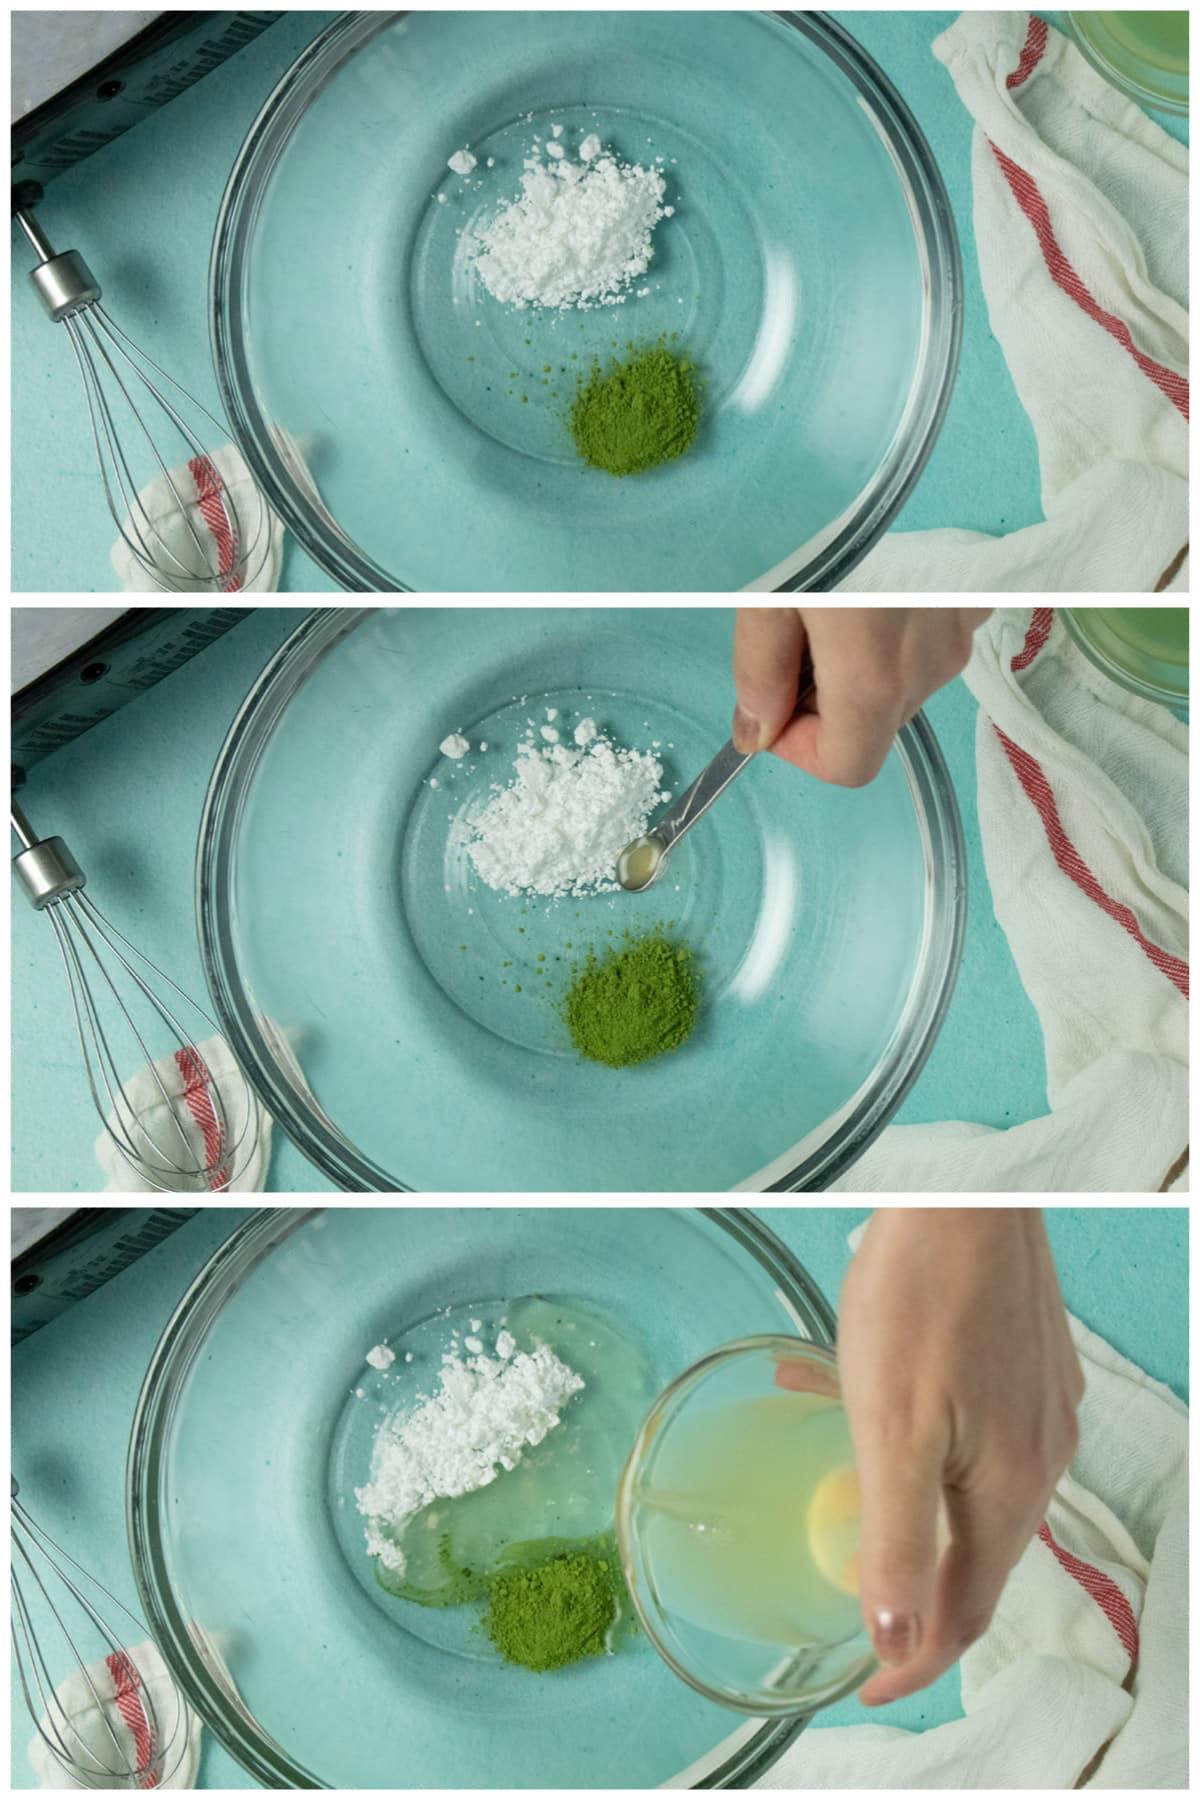 image collage showing matcha powder and powdered sugar in a large bowl, adding lemon juice, and adding aquafaba